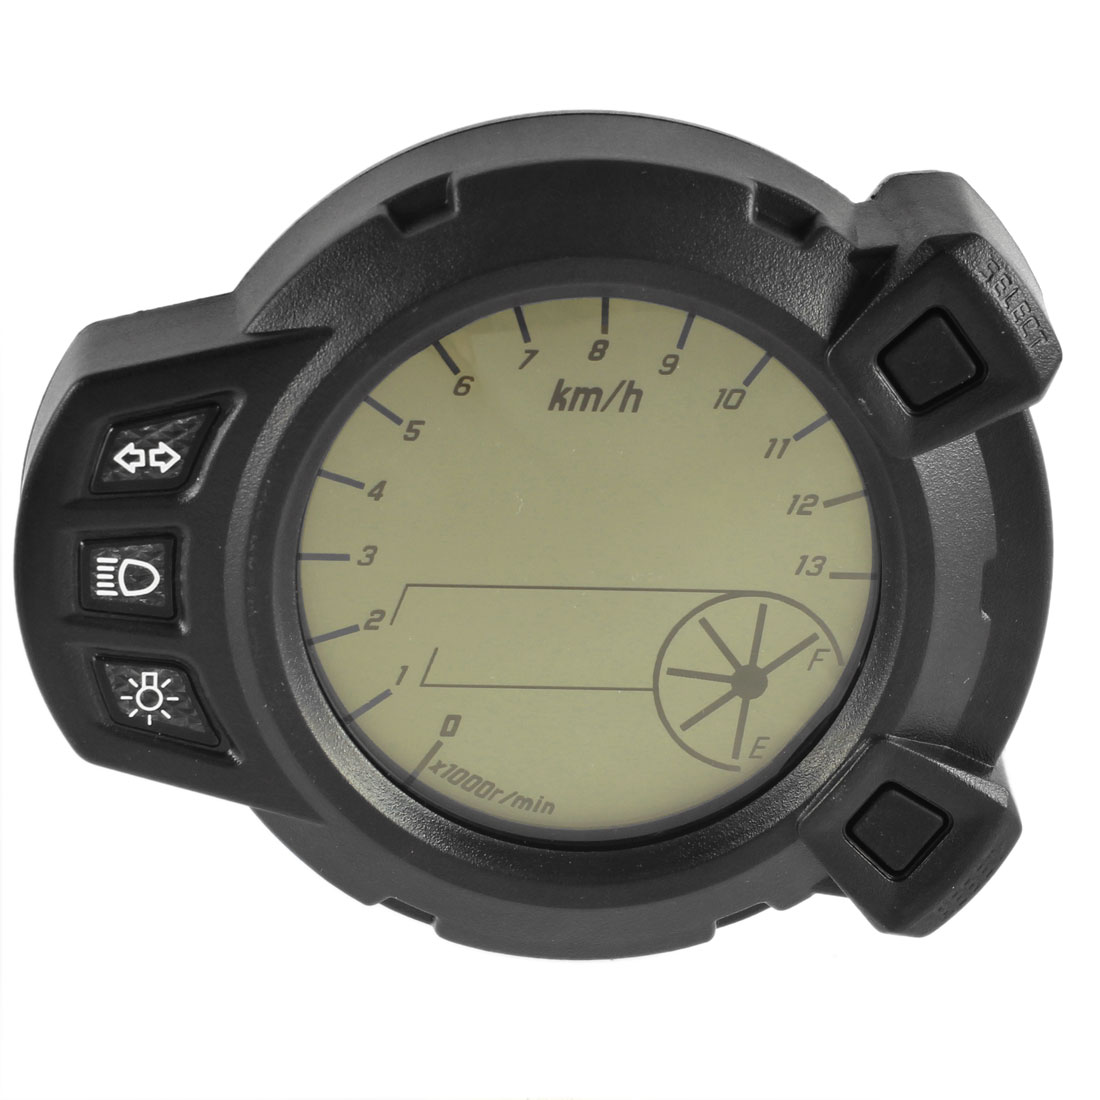 Motorbike LCD Digital Odometer Tachometer Speedometer Cluster w LED Light for BWS